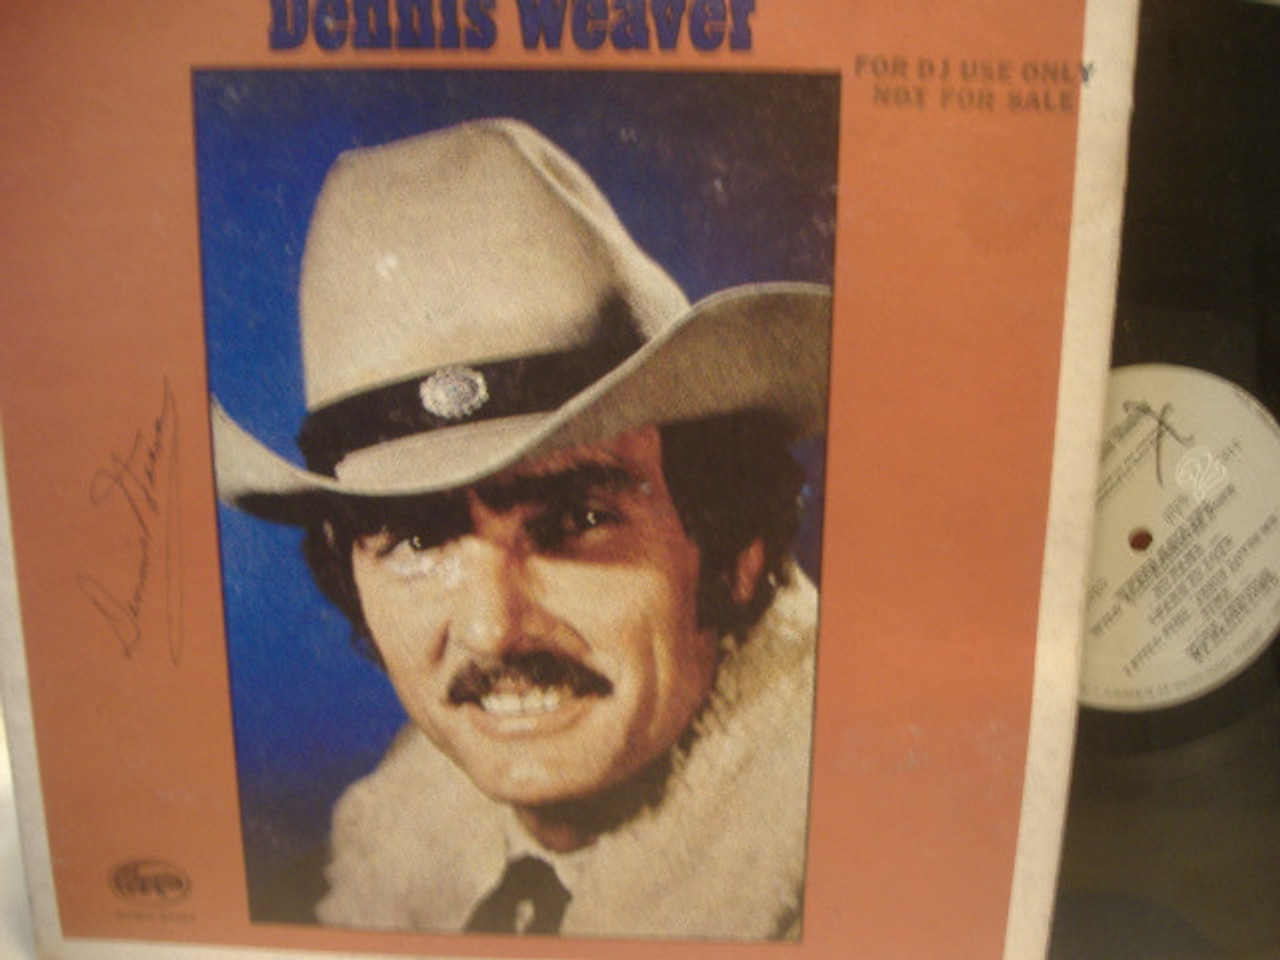 Weaver, Dennis LP Signed Autograph Another Way